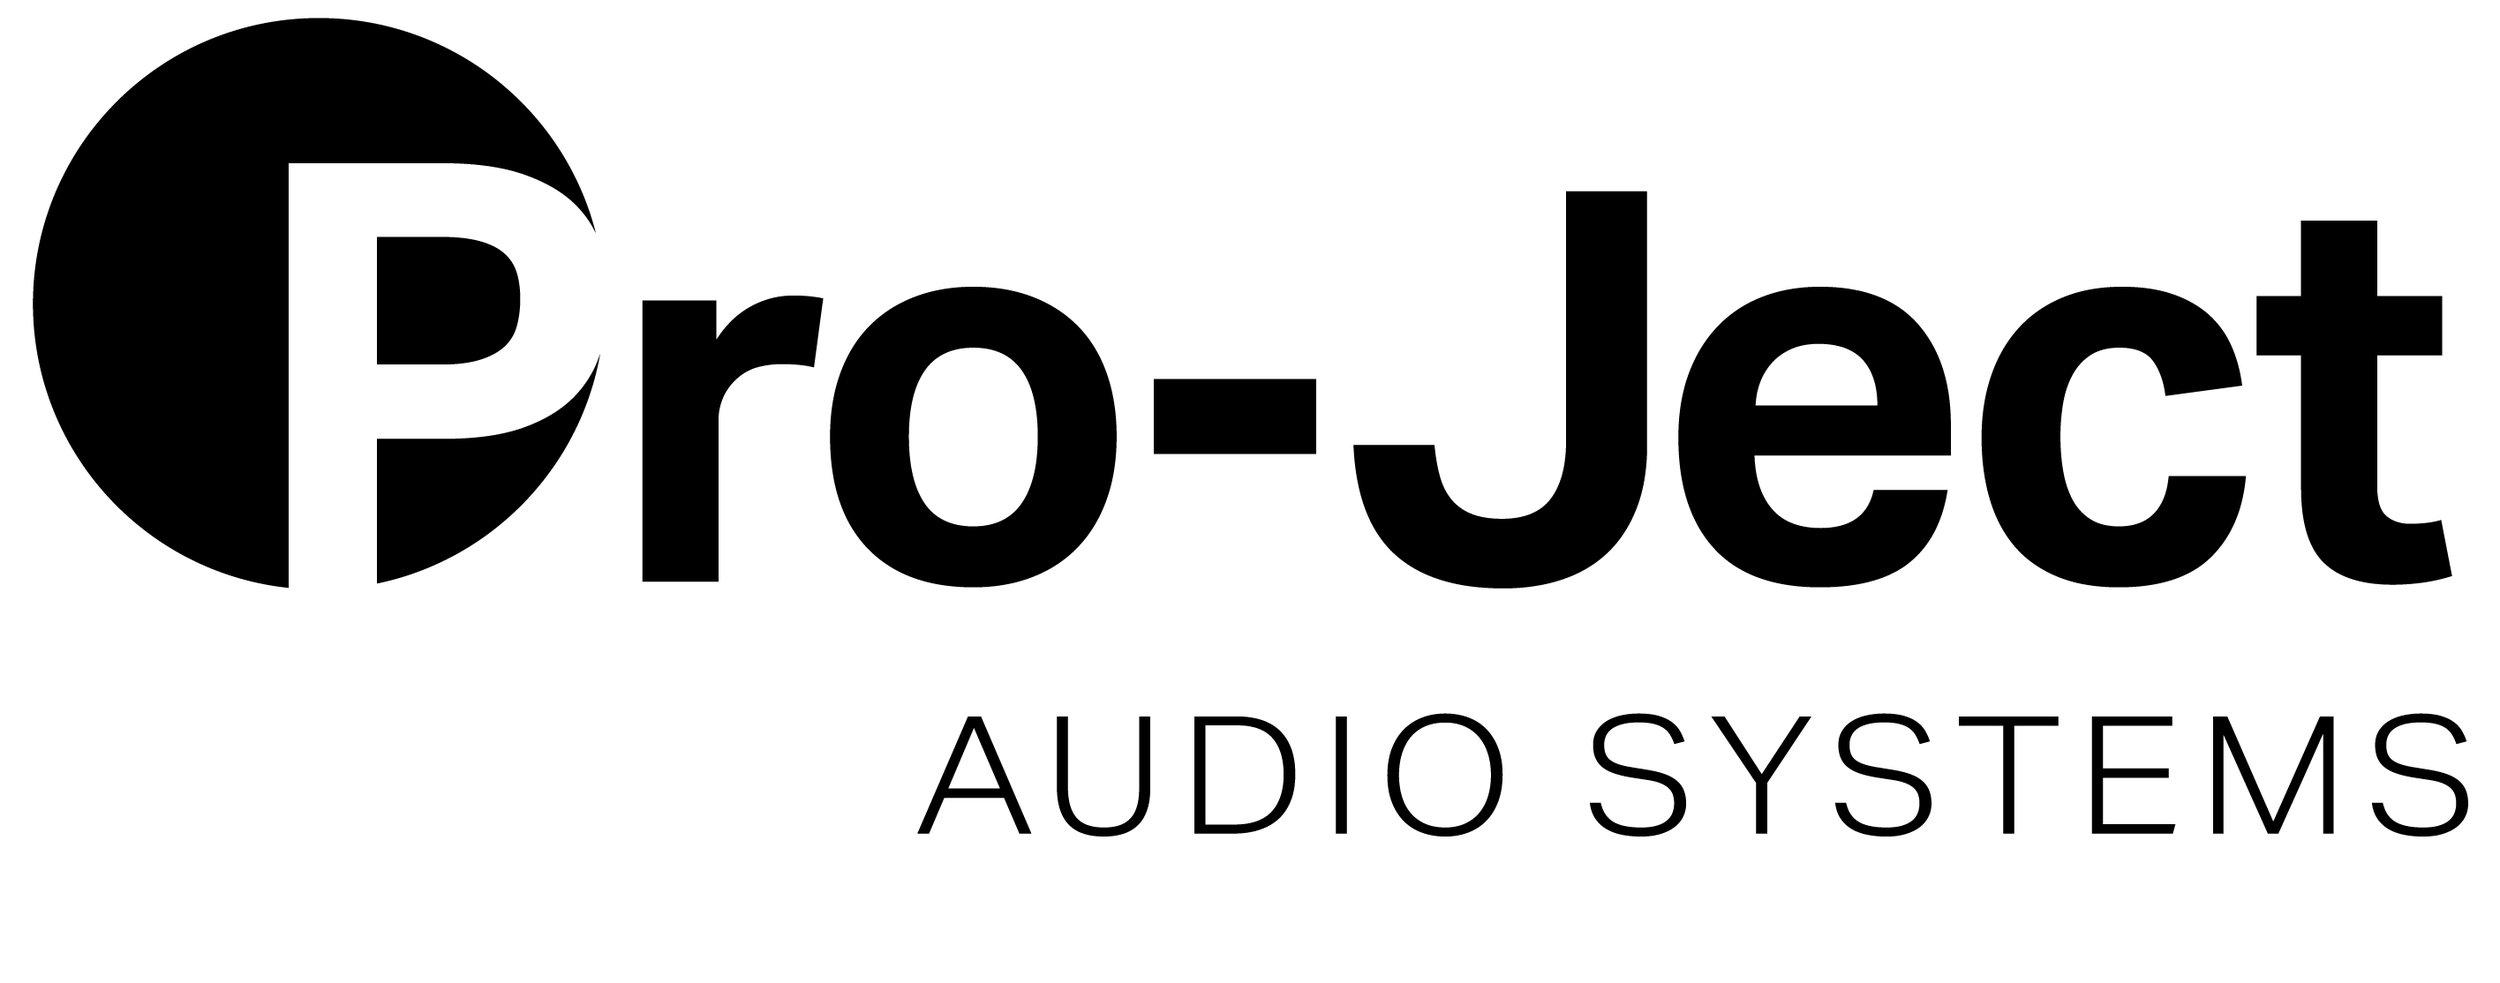 PJ-Audio-Systems-Logo-black.jpg